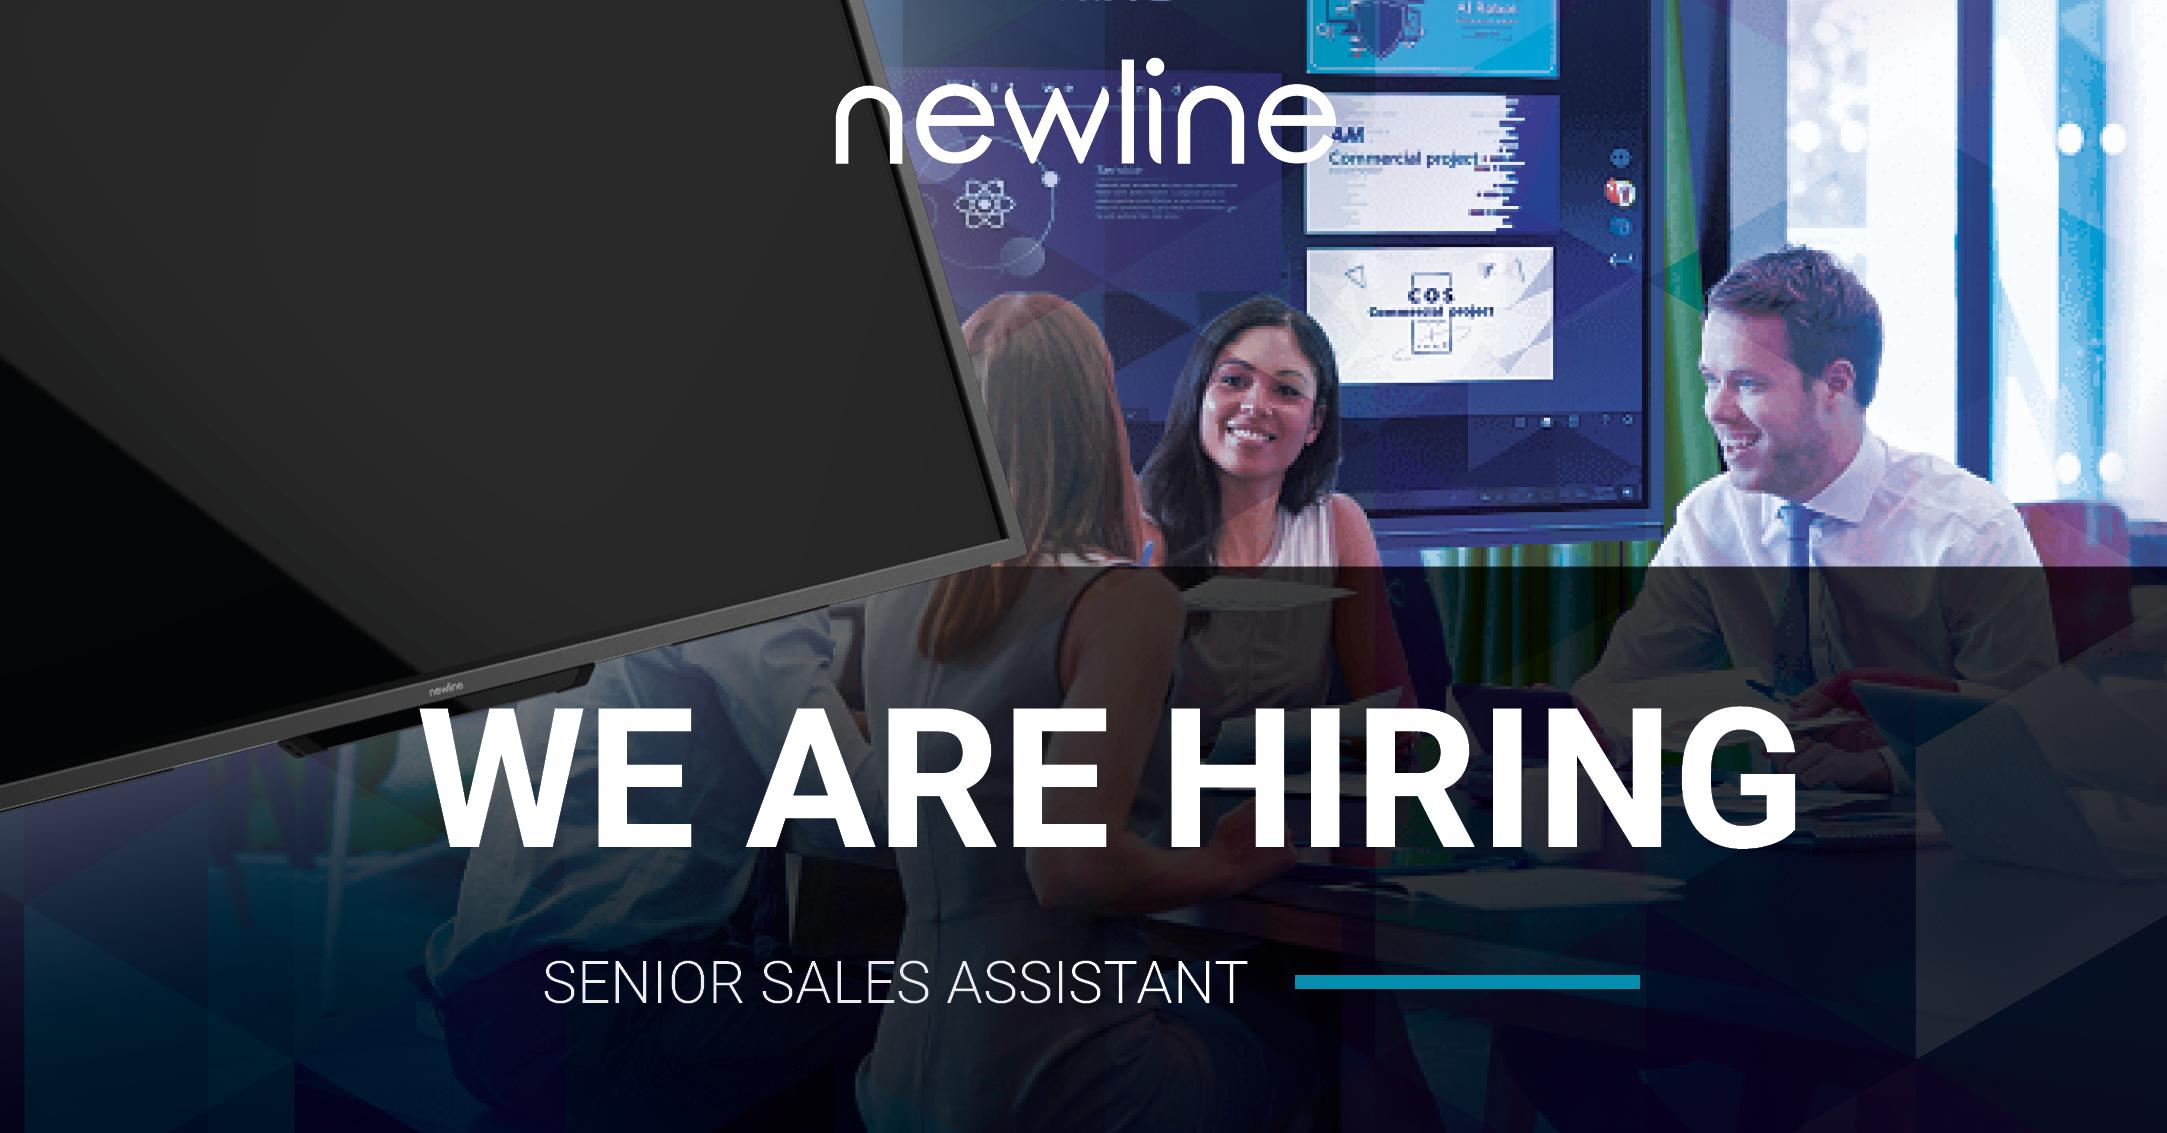 Newline is Hiring! Senior Sales Assistant